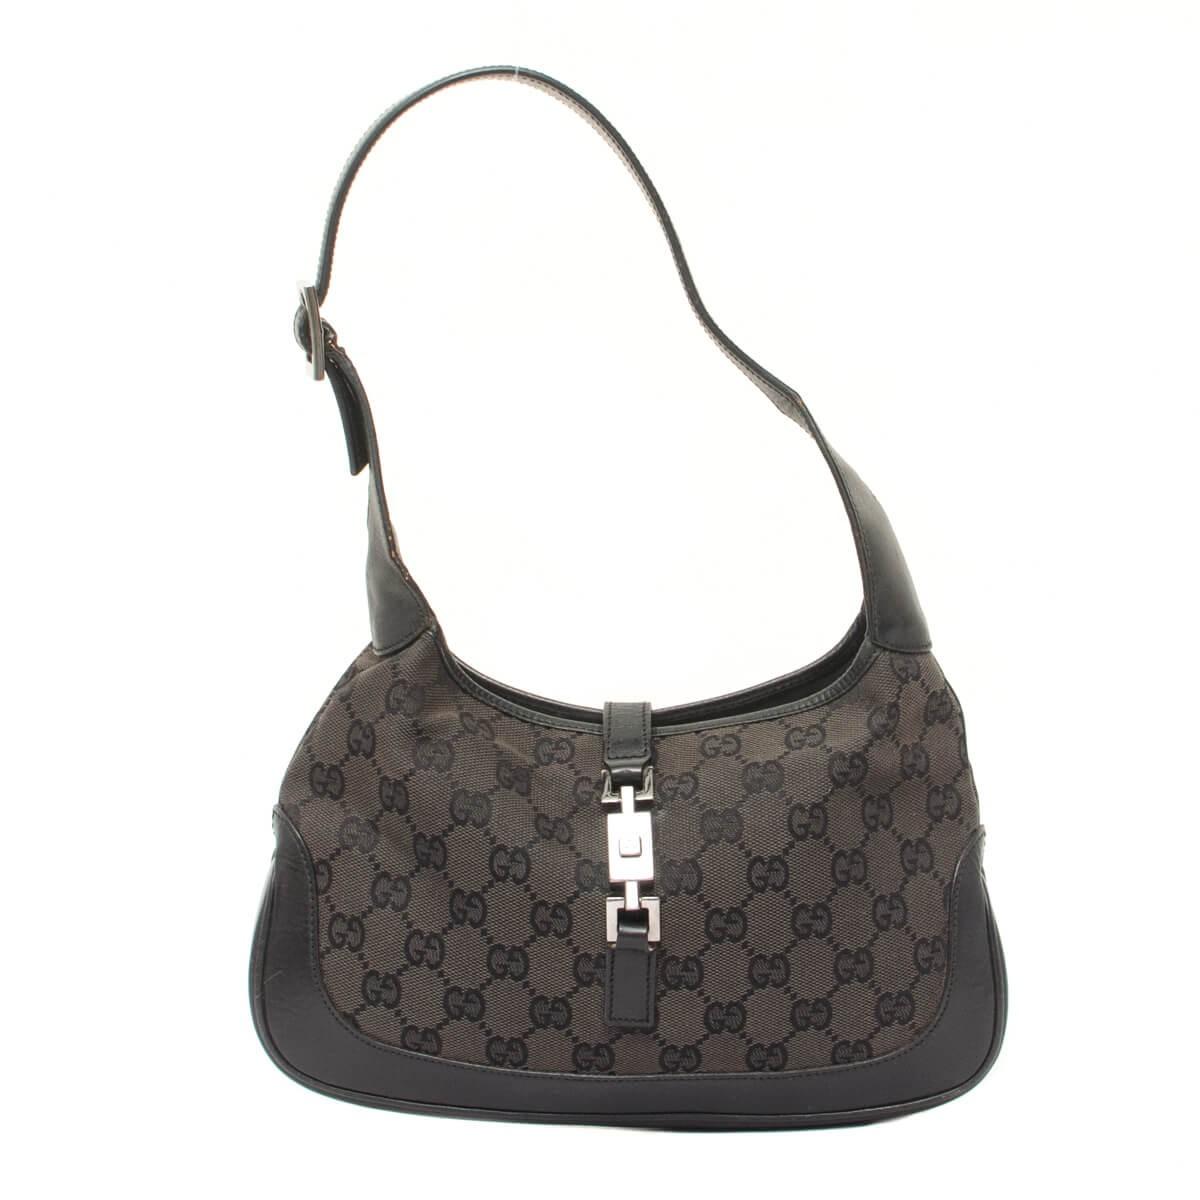 8f6341953 Jackie O Black Gg Monogram Canvas & Leather Hobo Bag